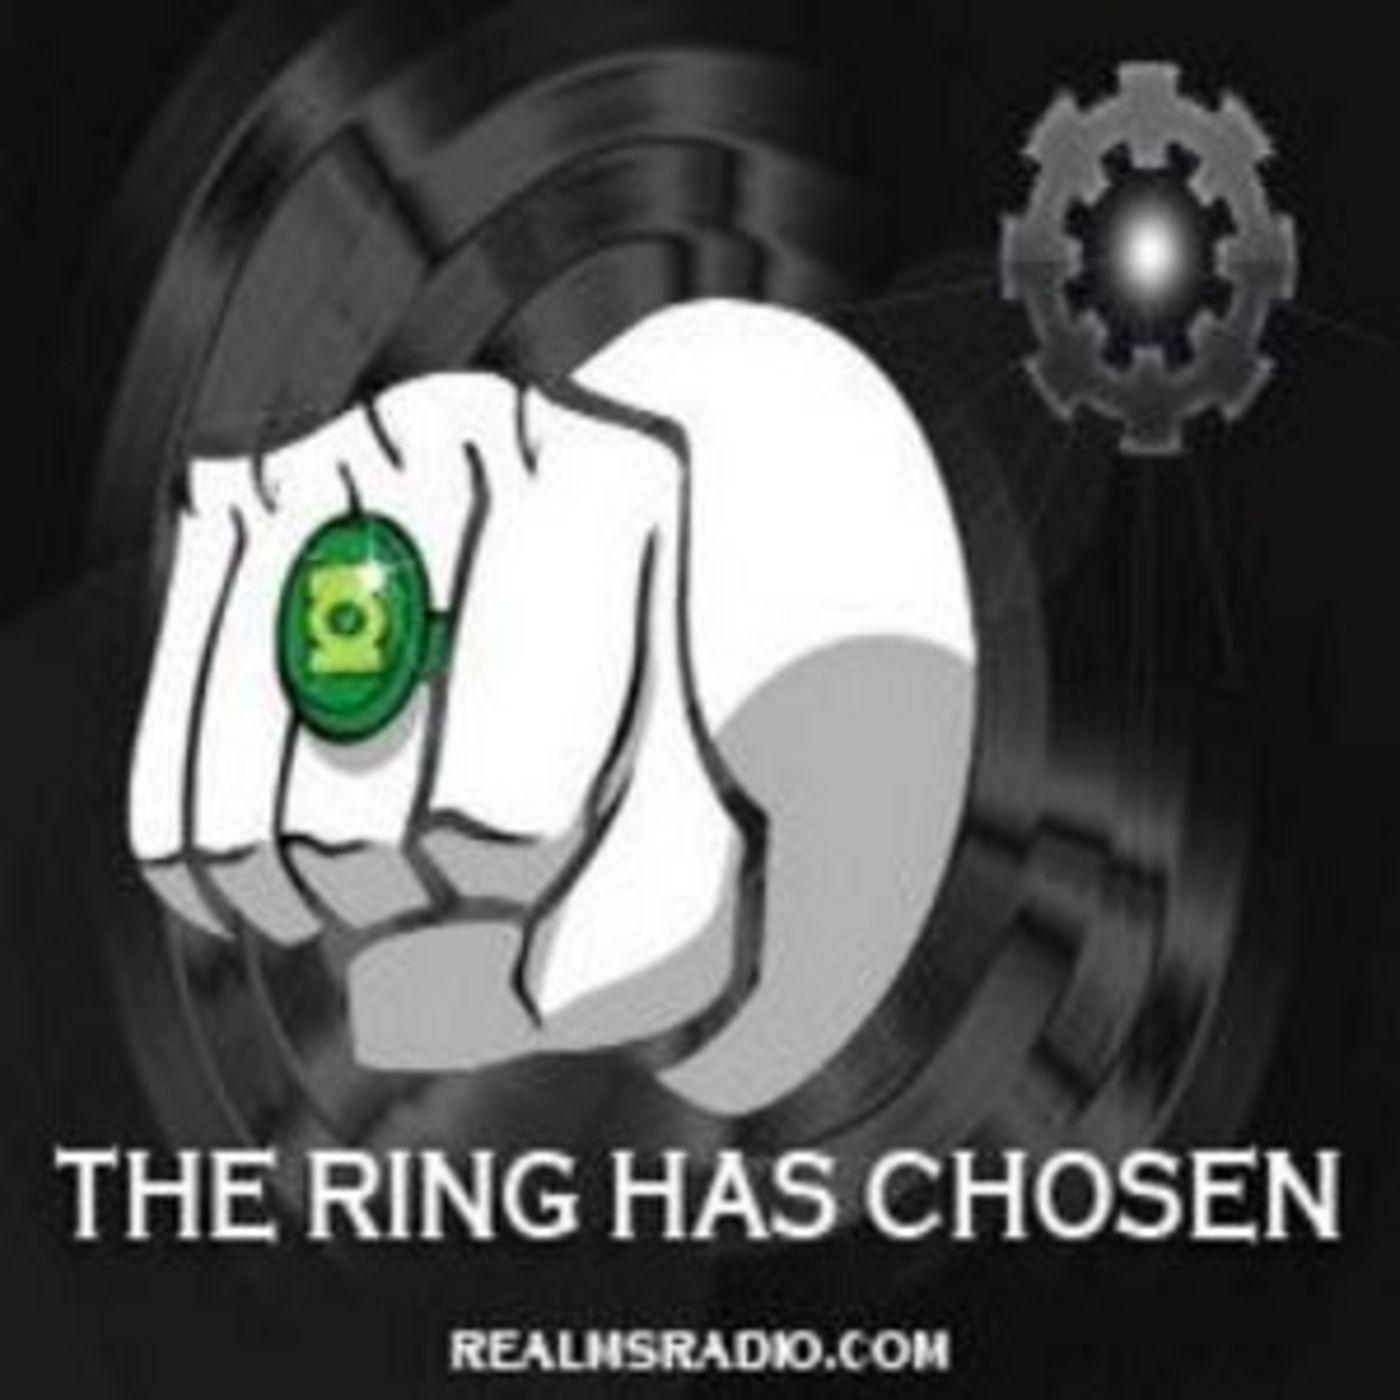 <![CDATA[The Ring Has Chosen]]>